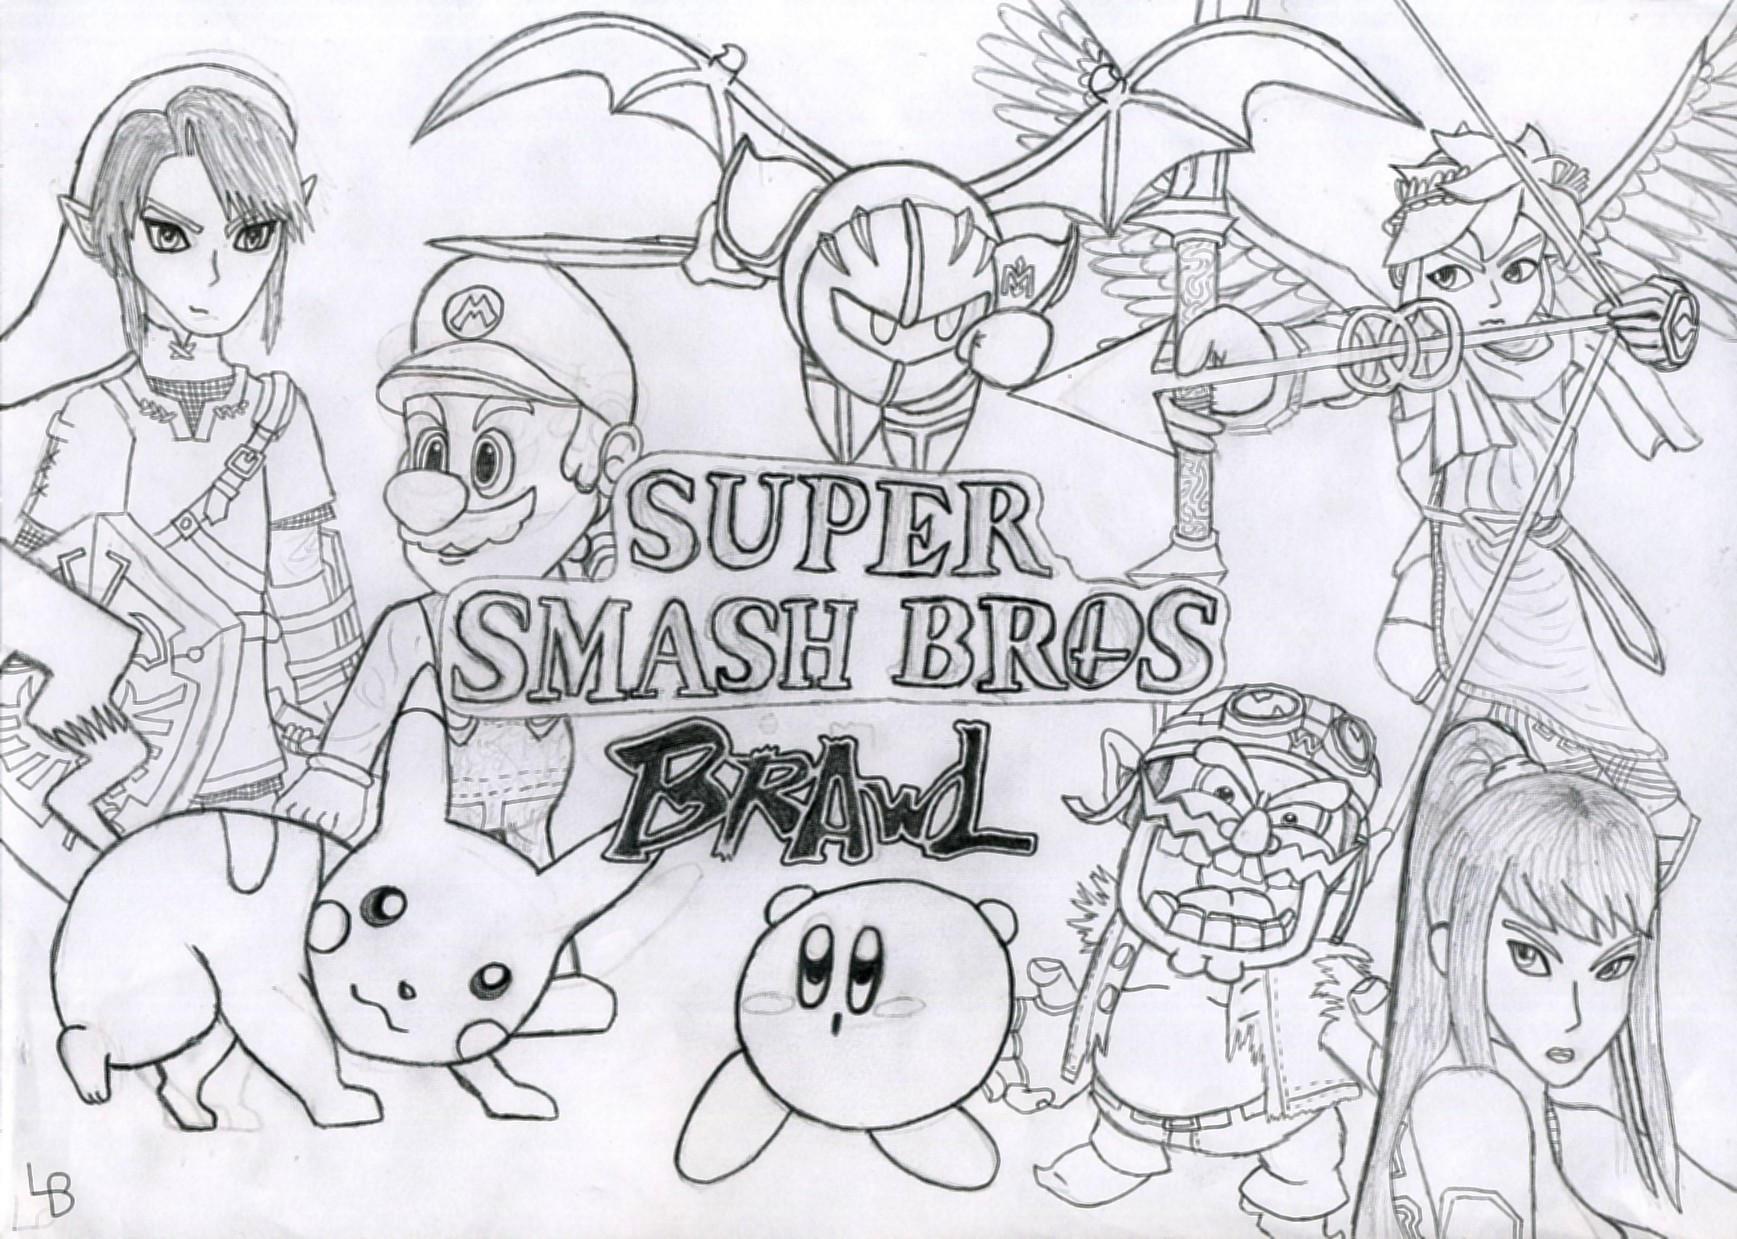 Uncategorized Super Smash Bros Brawl Coloring Pages super smash brothers brawl coloring pages murderthestout bros colouring thestout